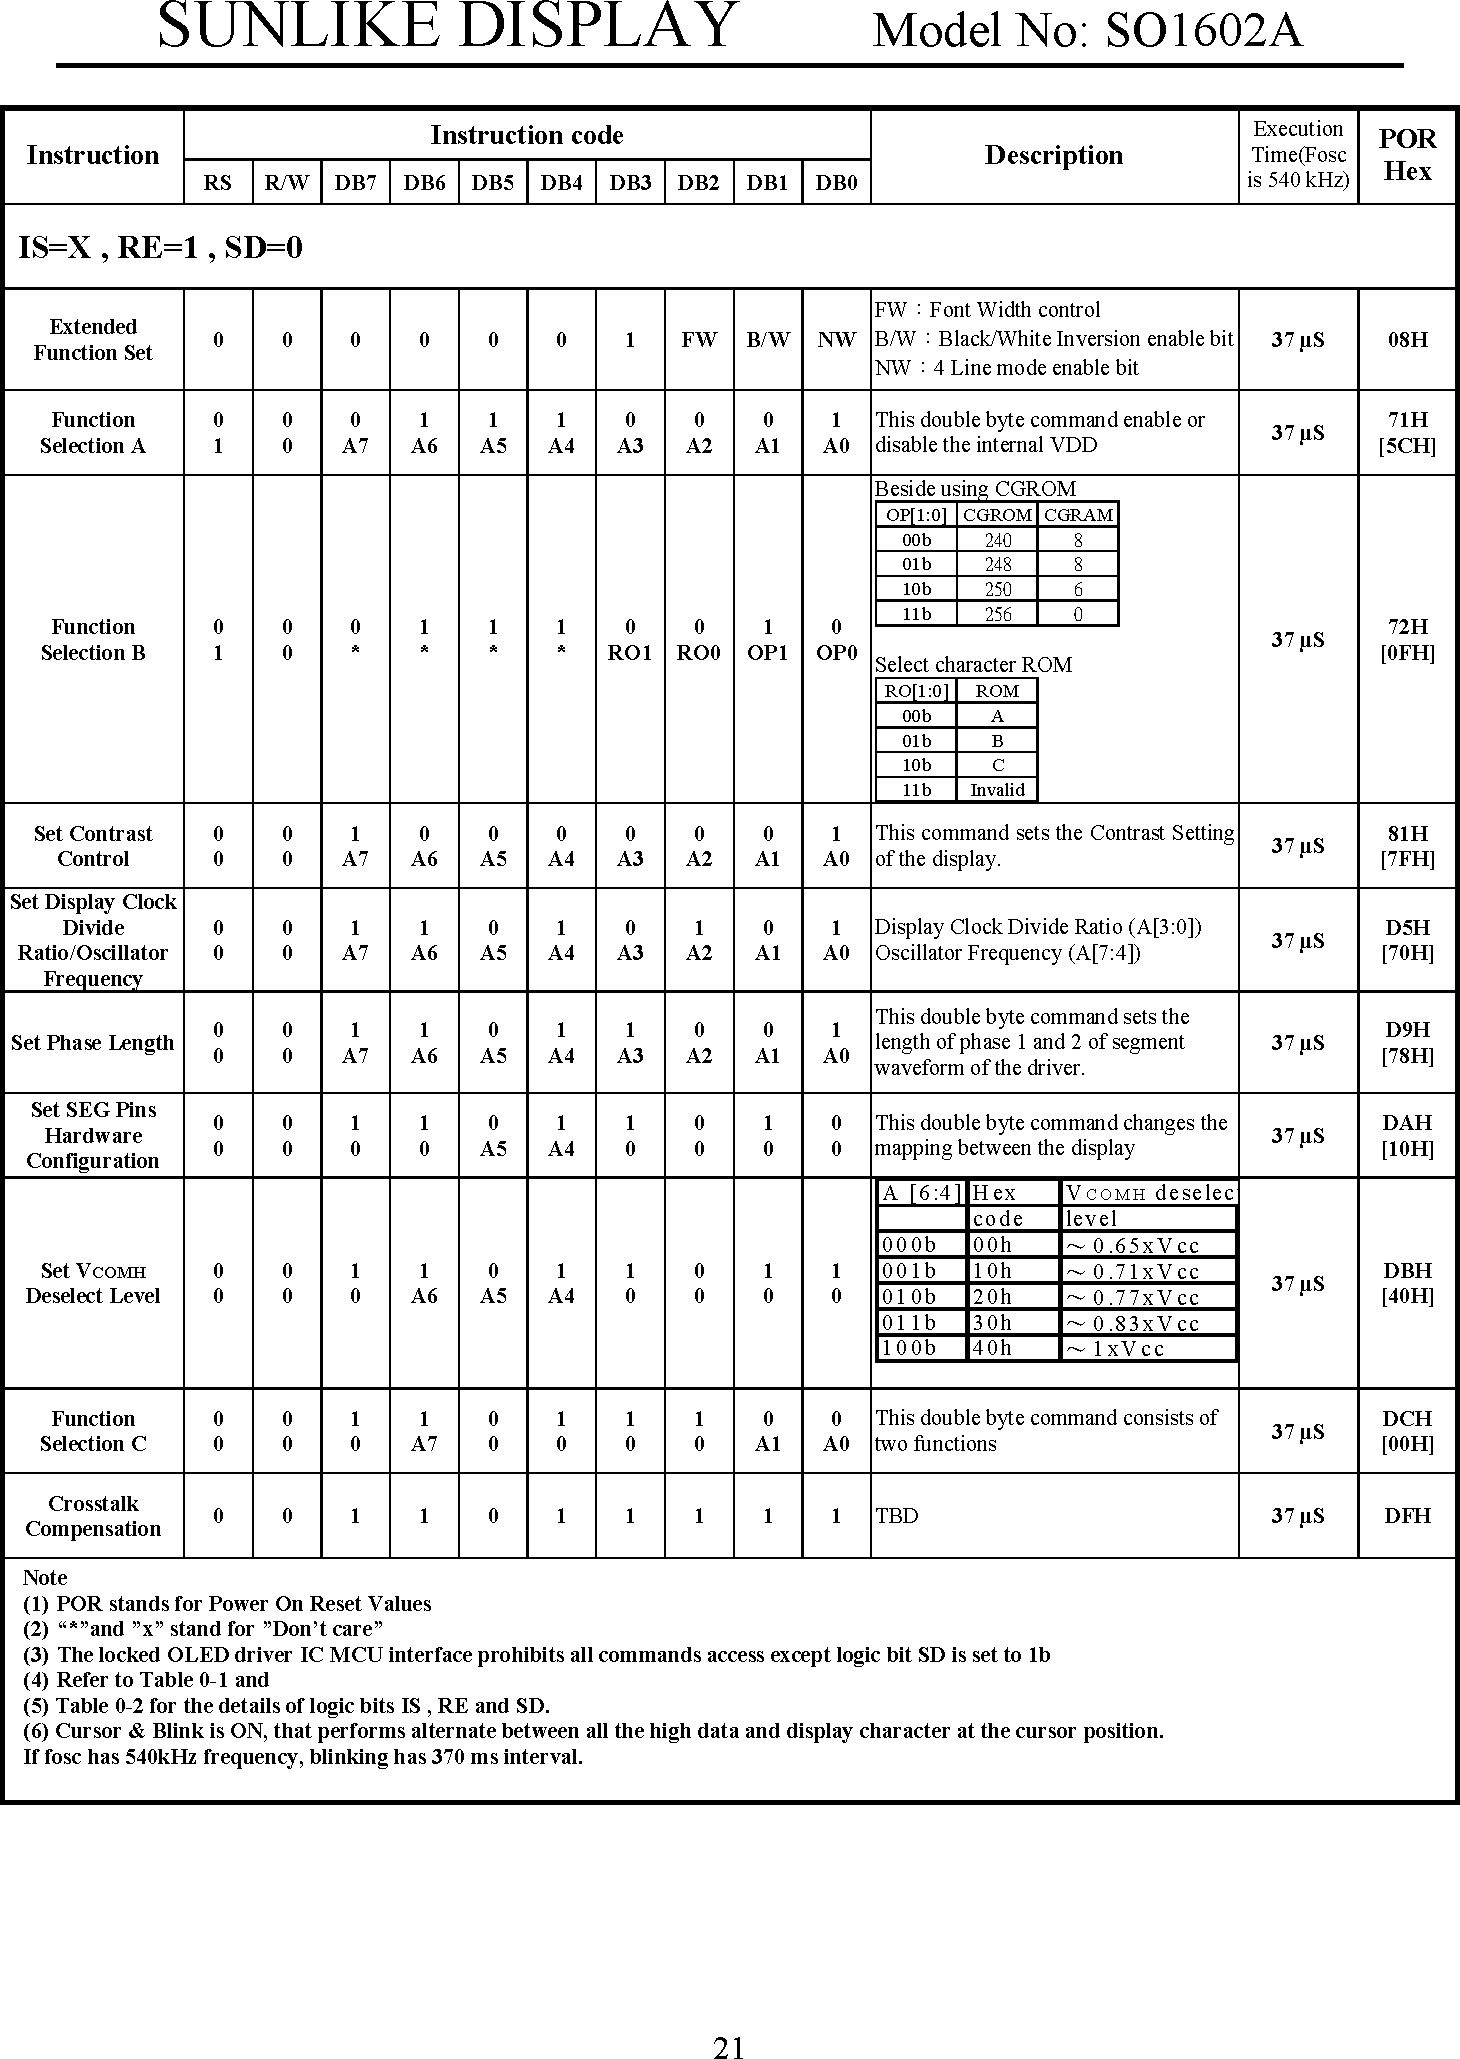 SO1602A-p21